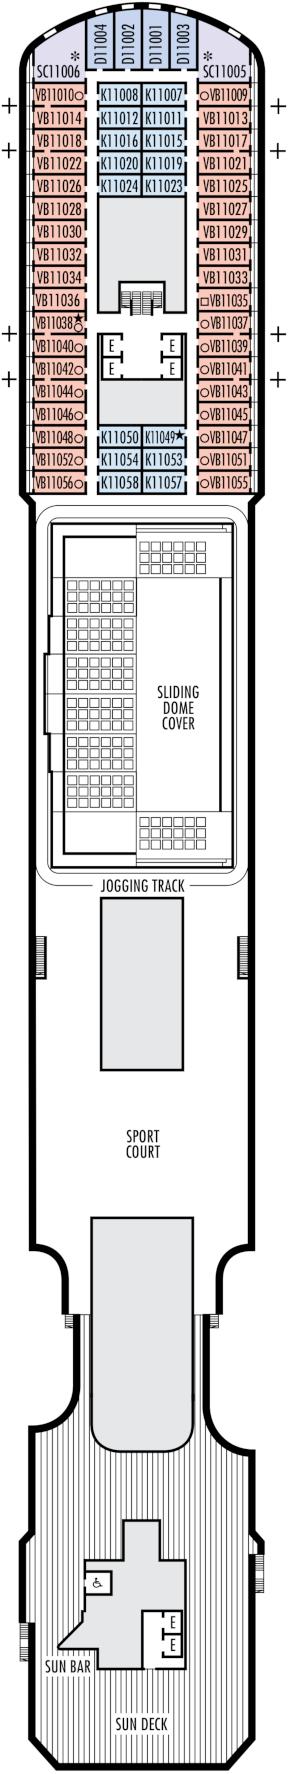 Nieuw Statendam Sun Deck Deck Plan